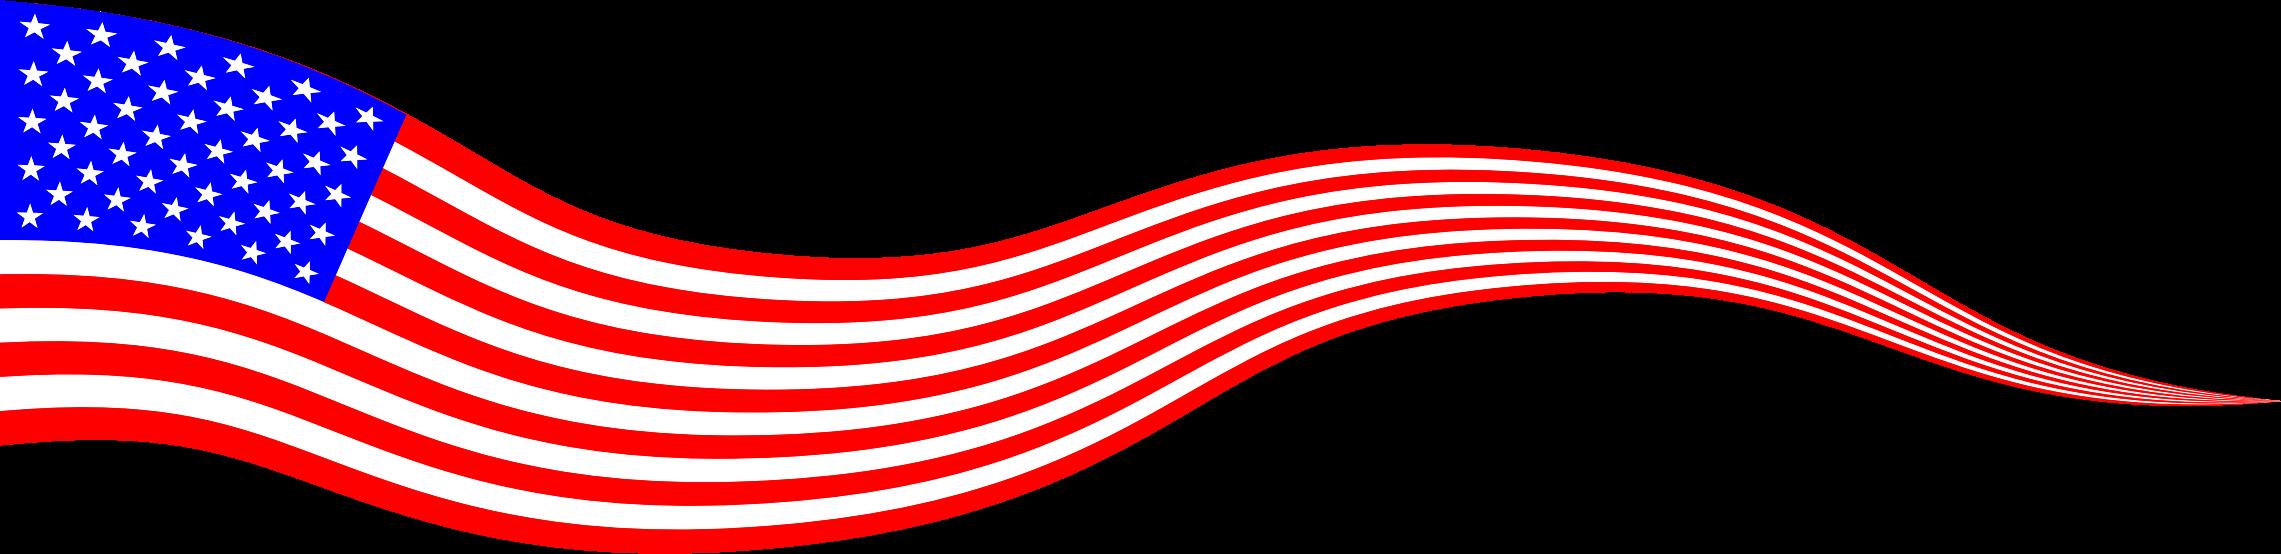 Patriotic clipart wavy, Patriotic wavy Transparent FREE ...